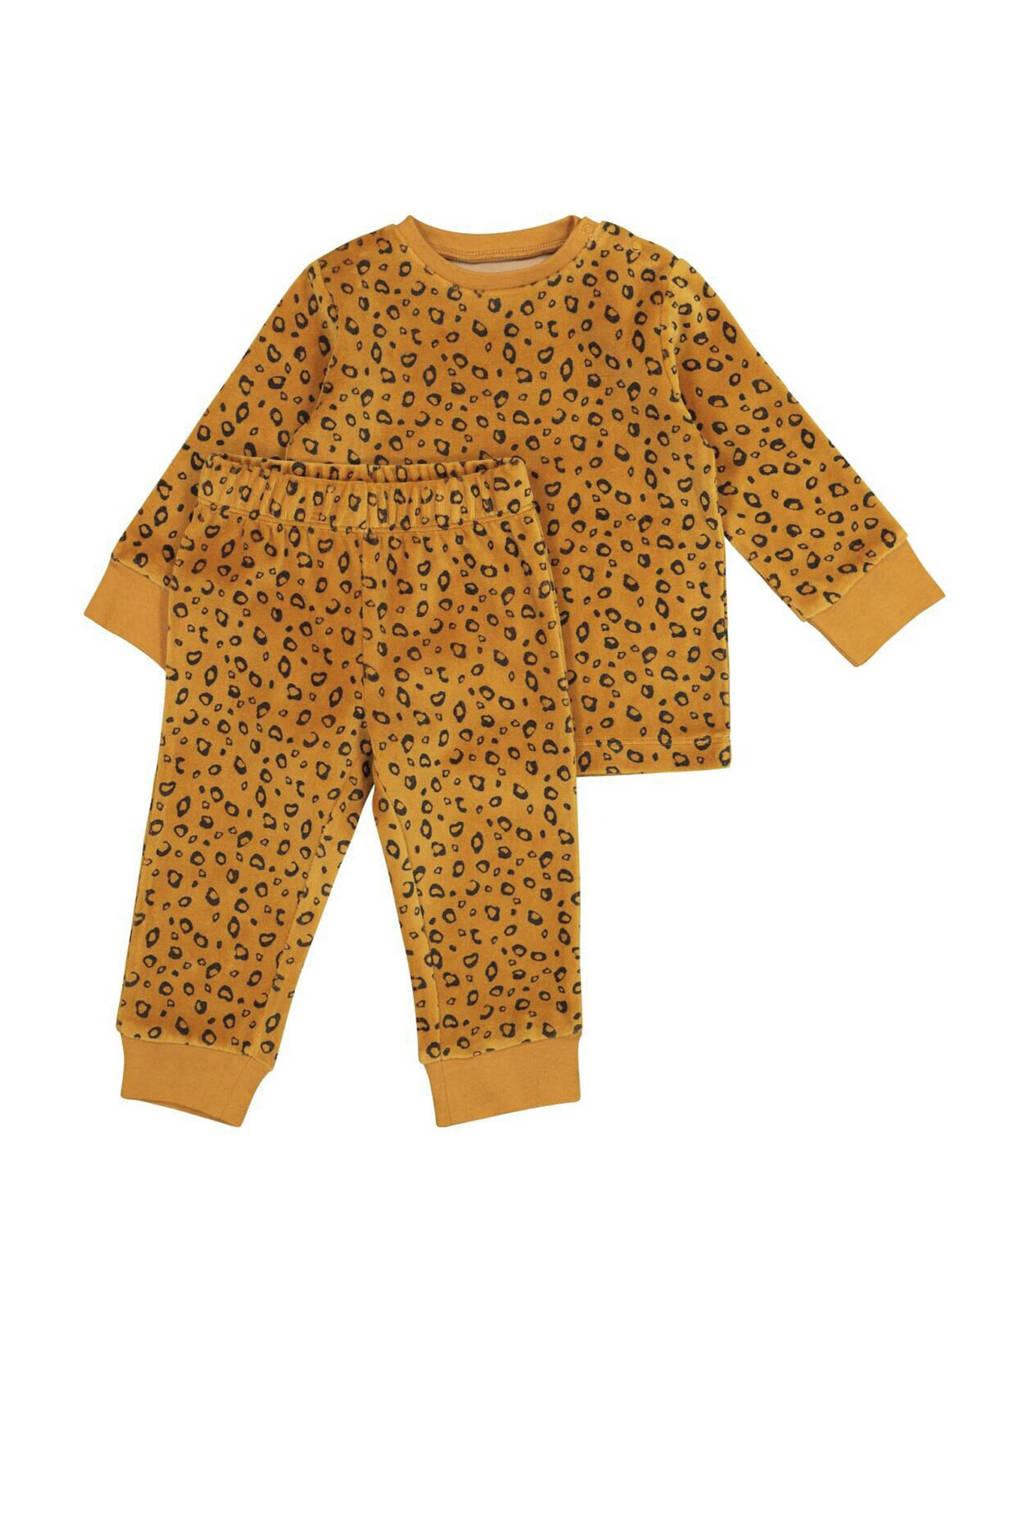 HEMA   velours pyjama all over print bruin/zwart, Bruin